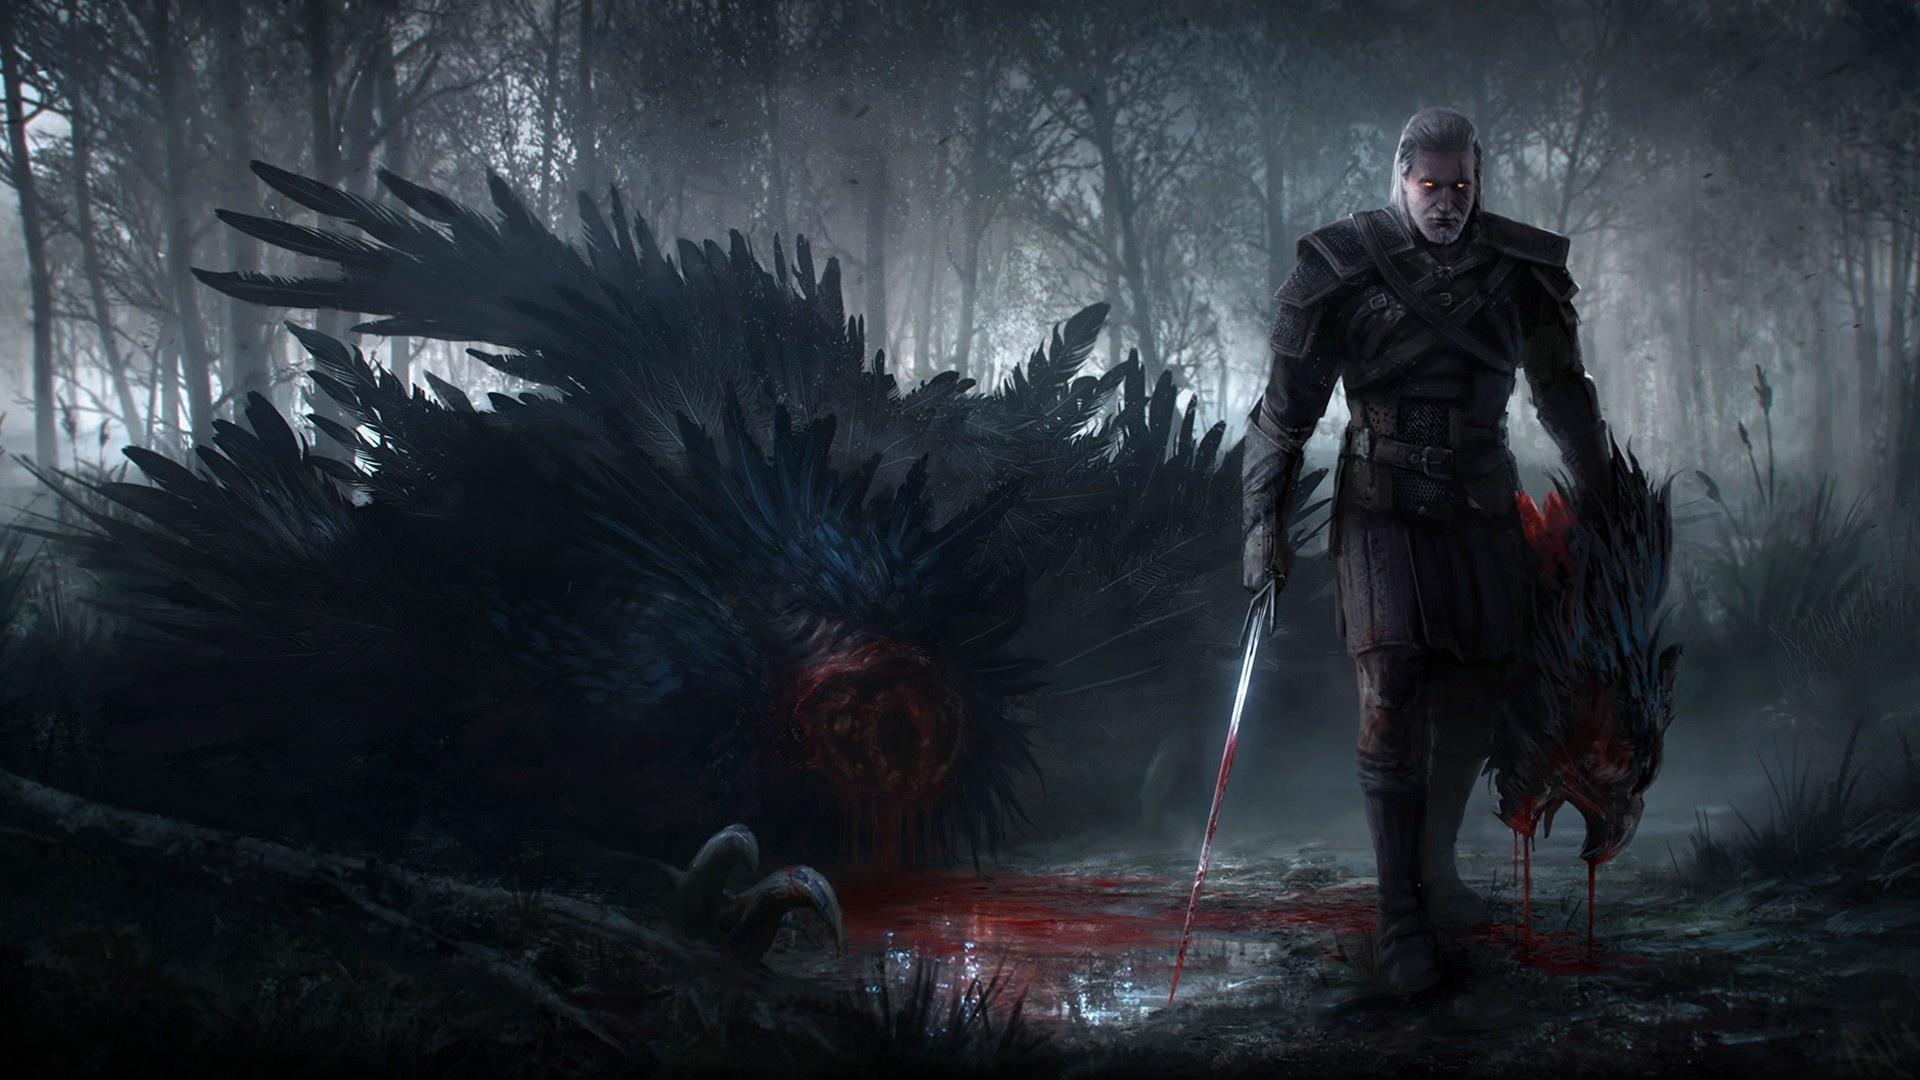 The Witcher 3 para switch podría estar al llegar